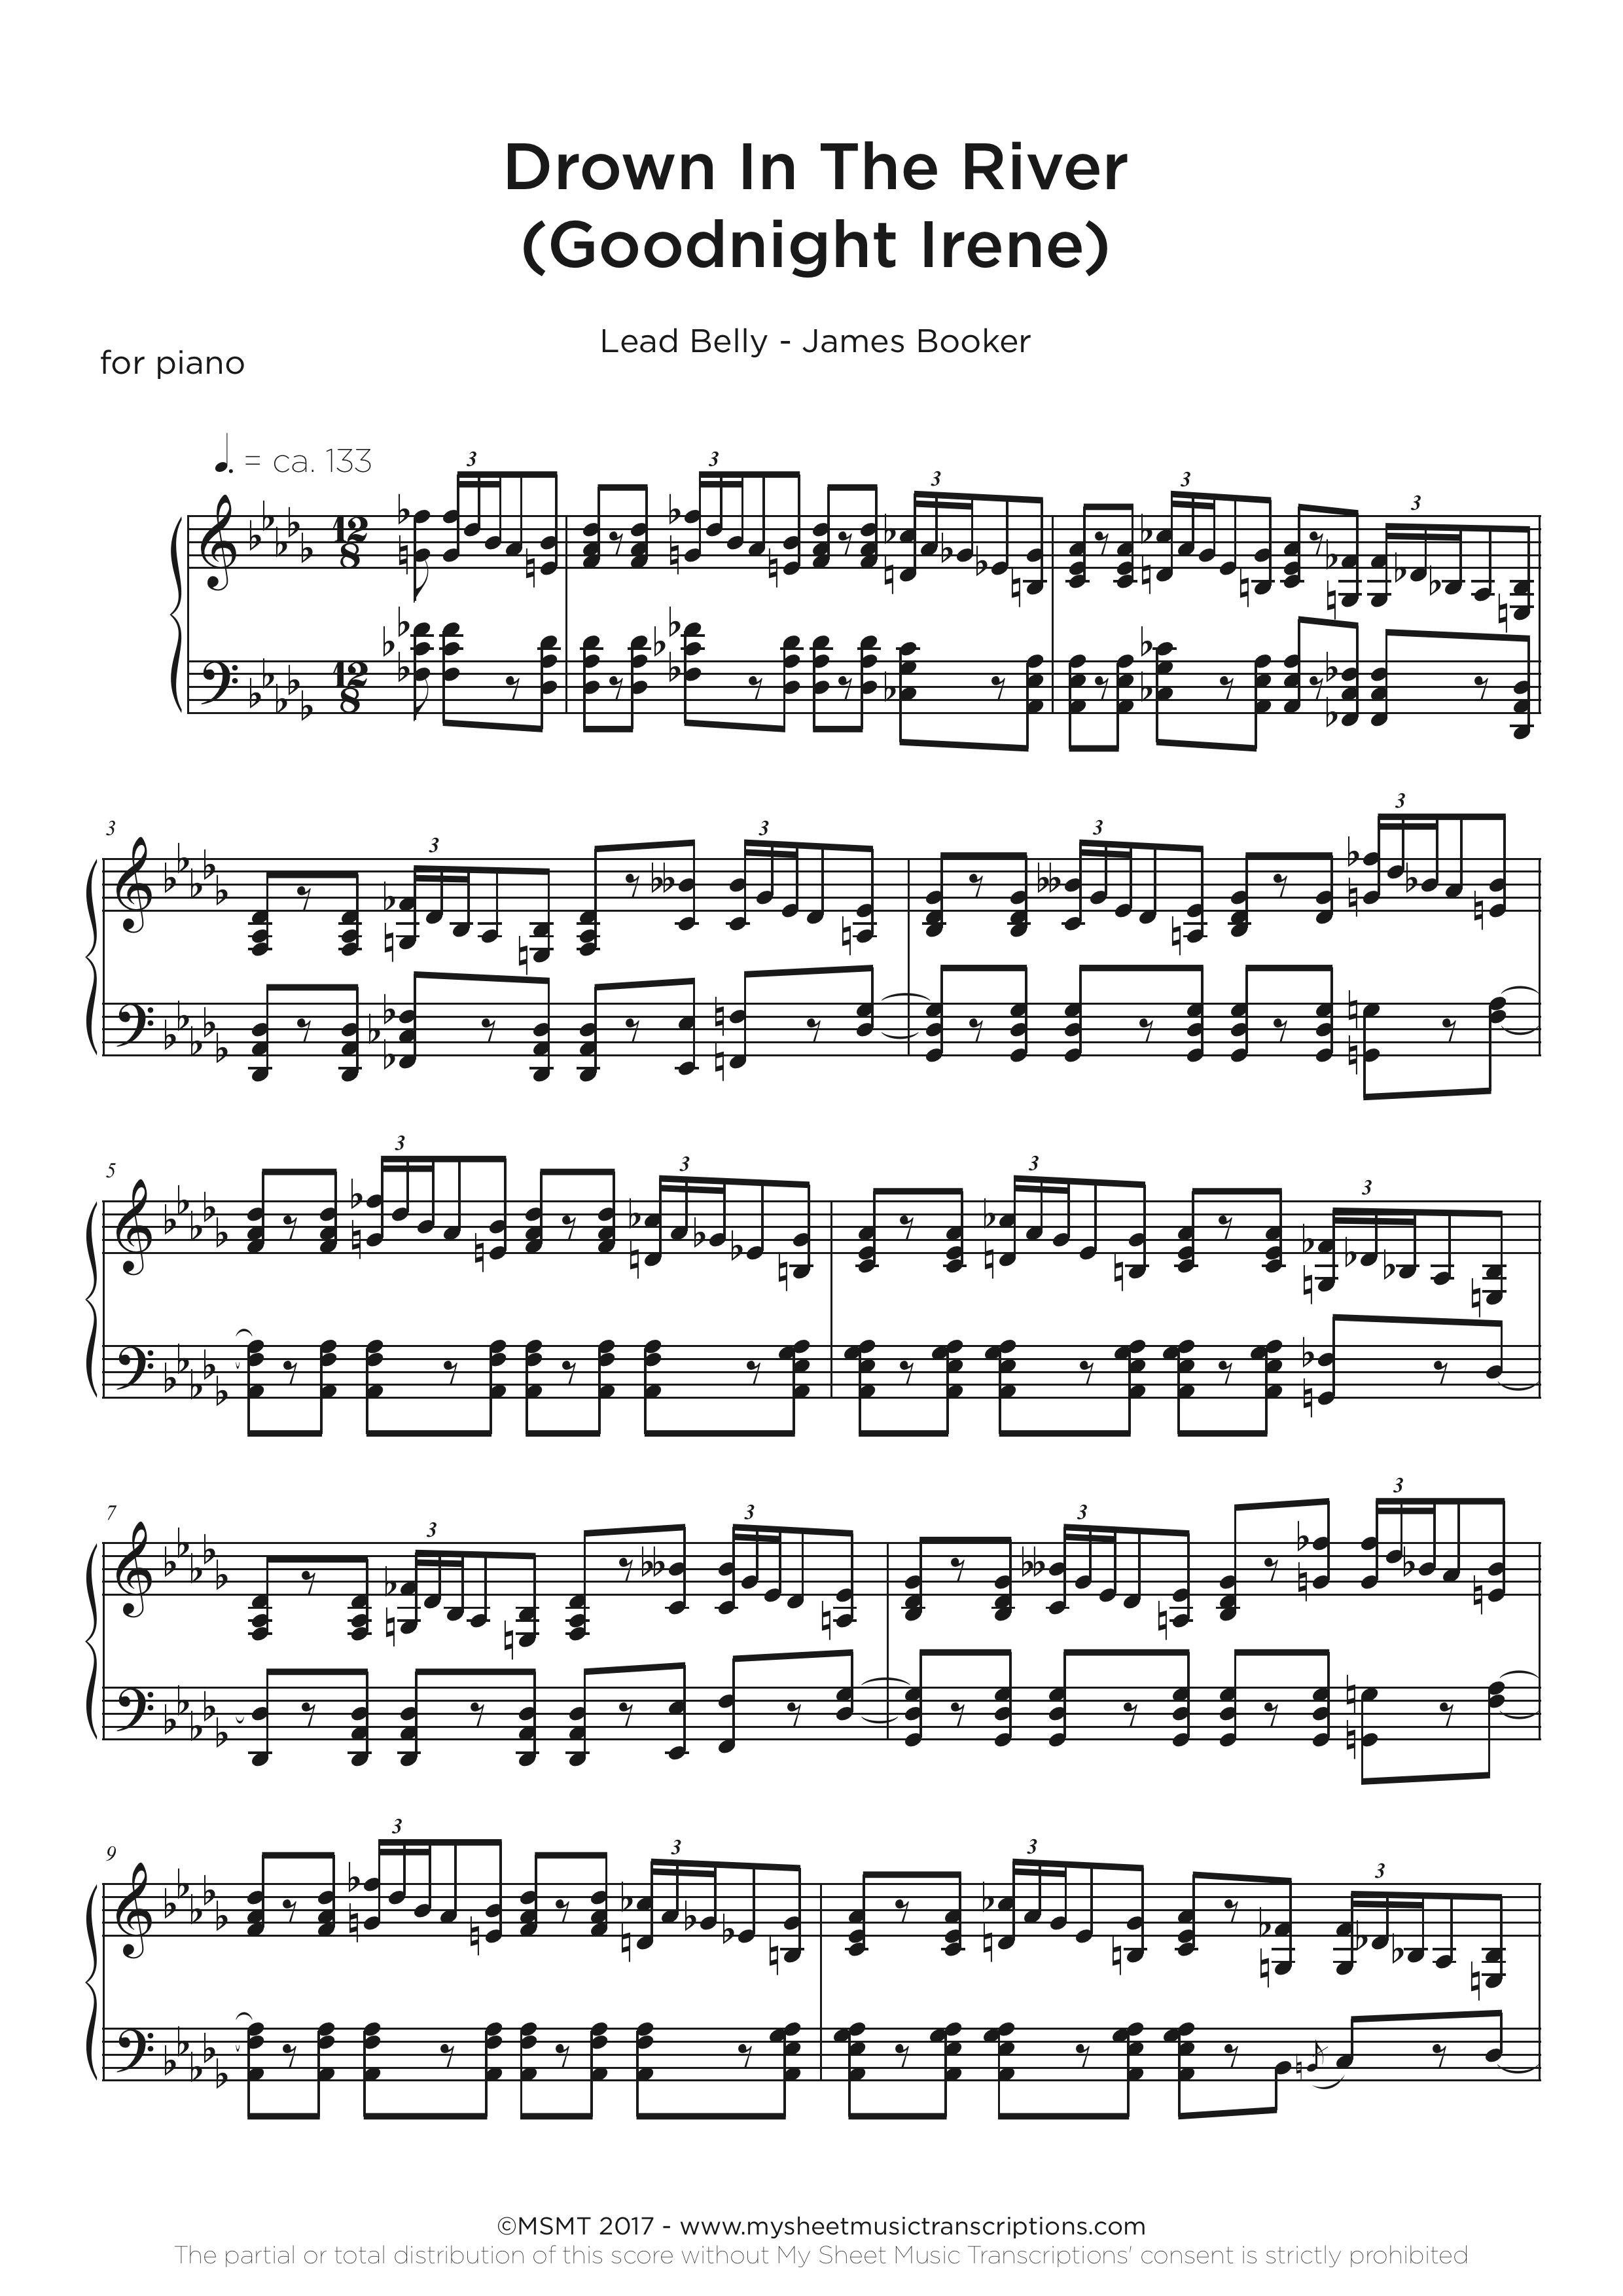 Piano Blues Transcription Service - James Booker